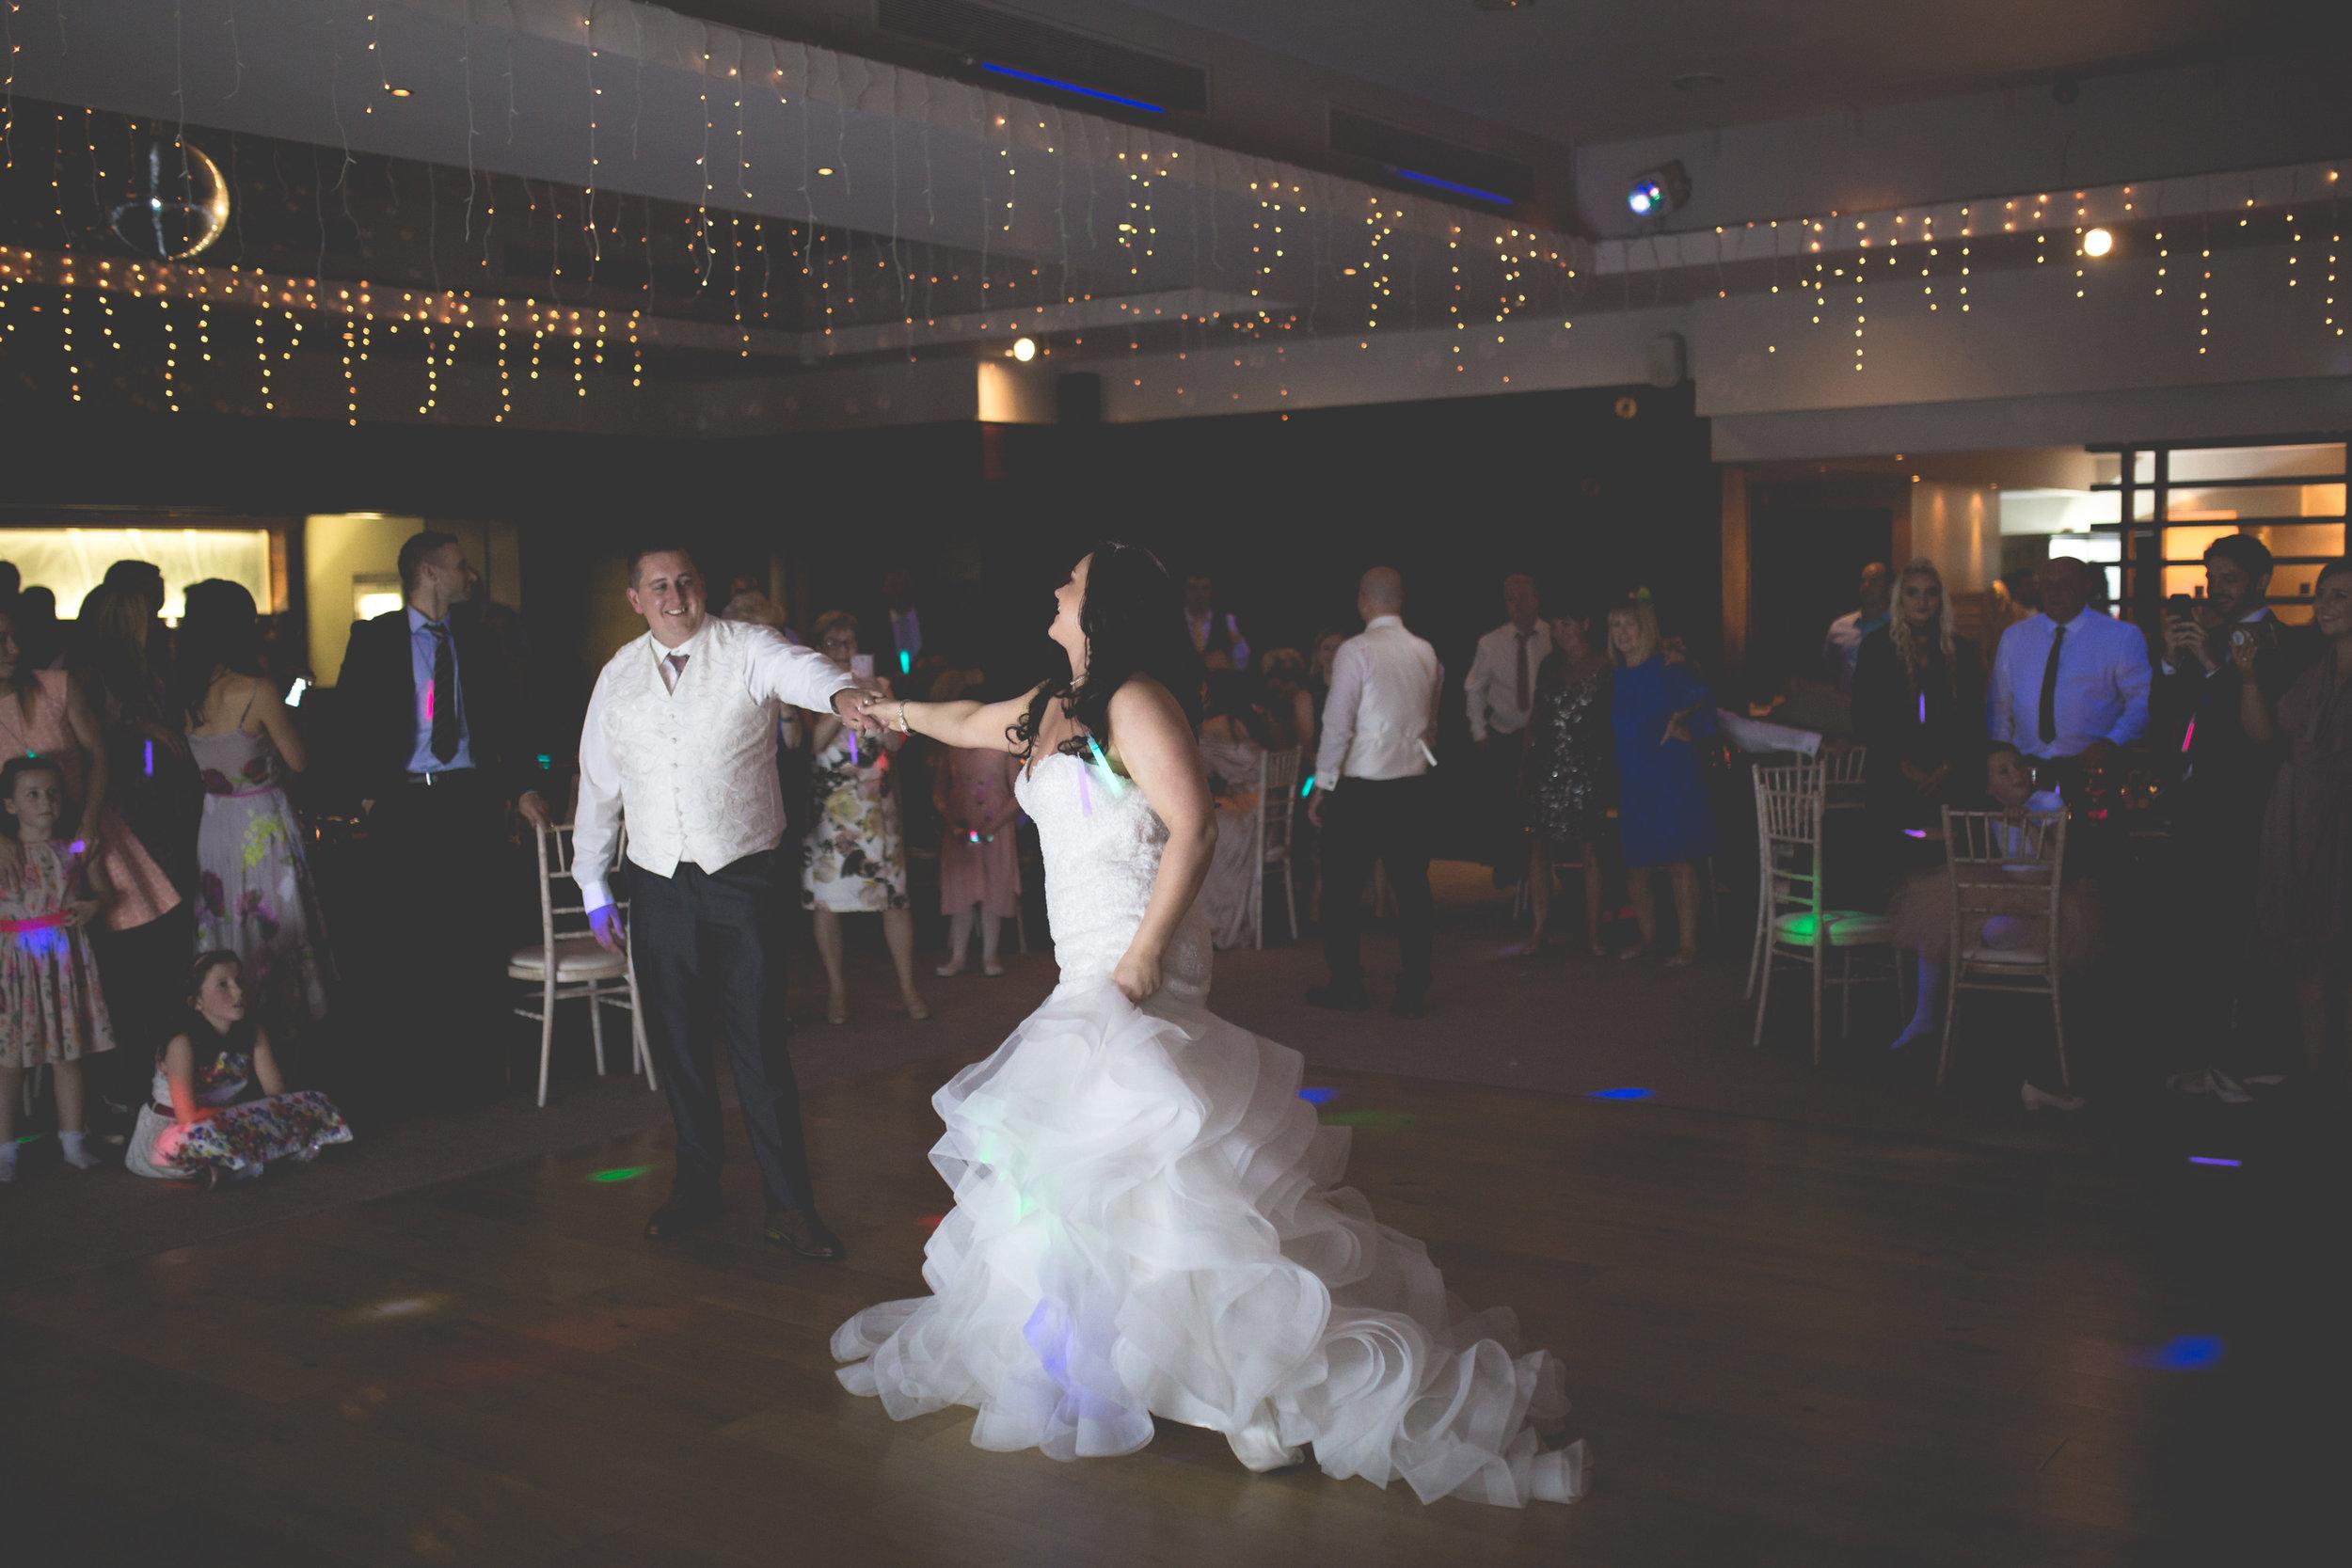 Helena & Terence - First Dance-17.jpg